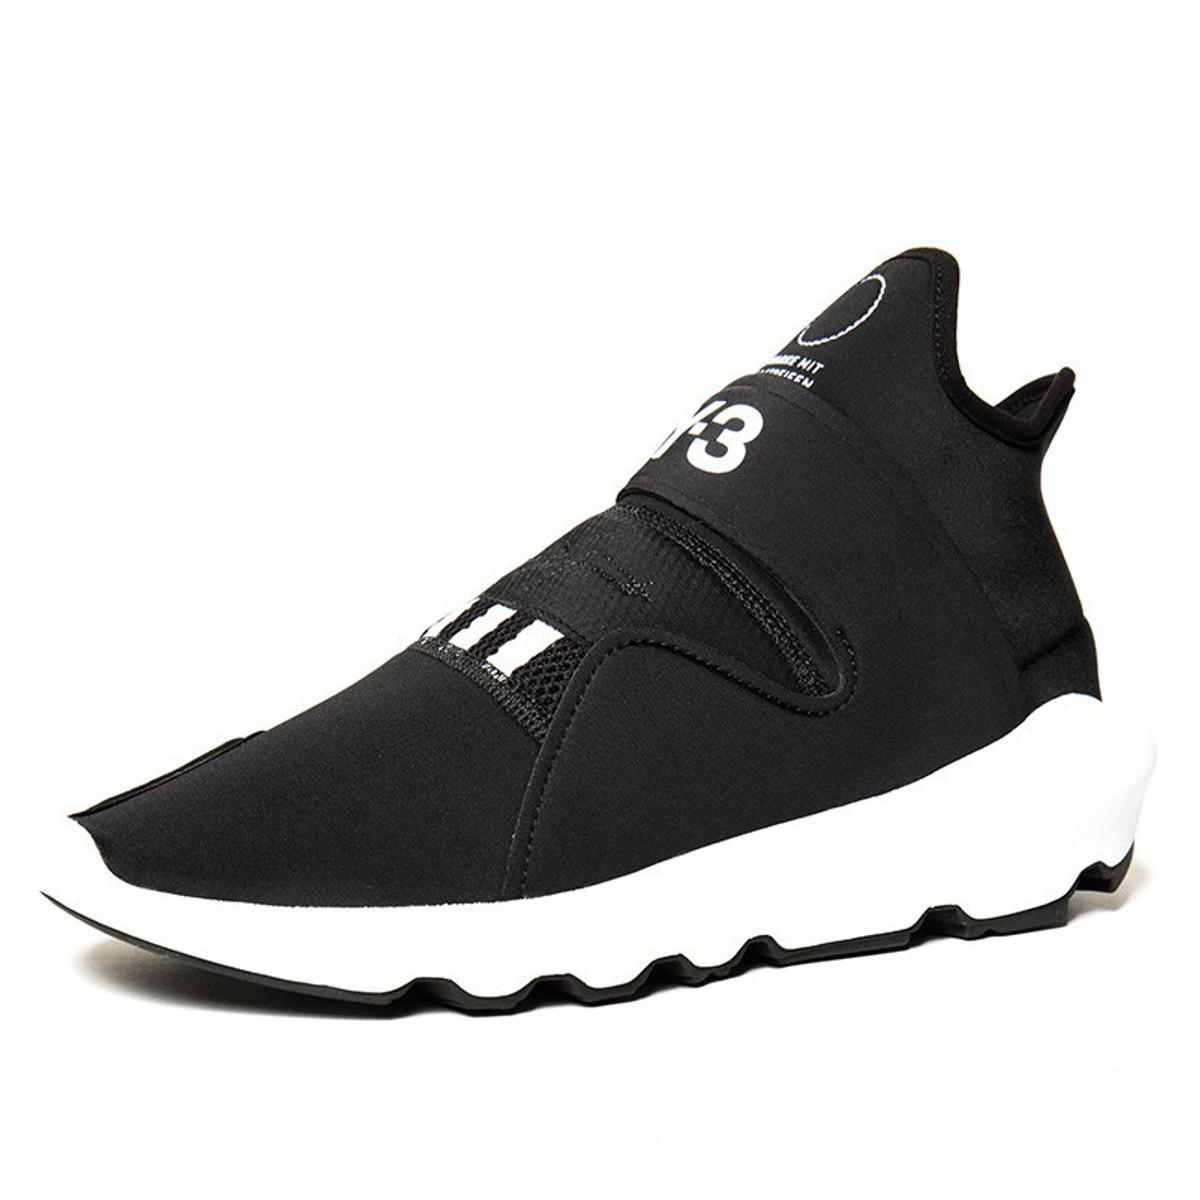 a38268b94c5a3 Y-3 Suberou Black Glove Sneaker for Men